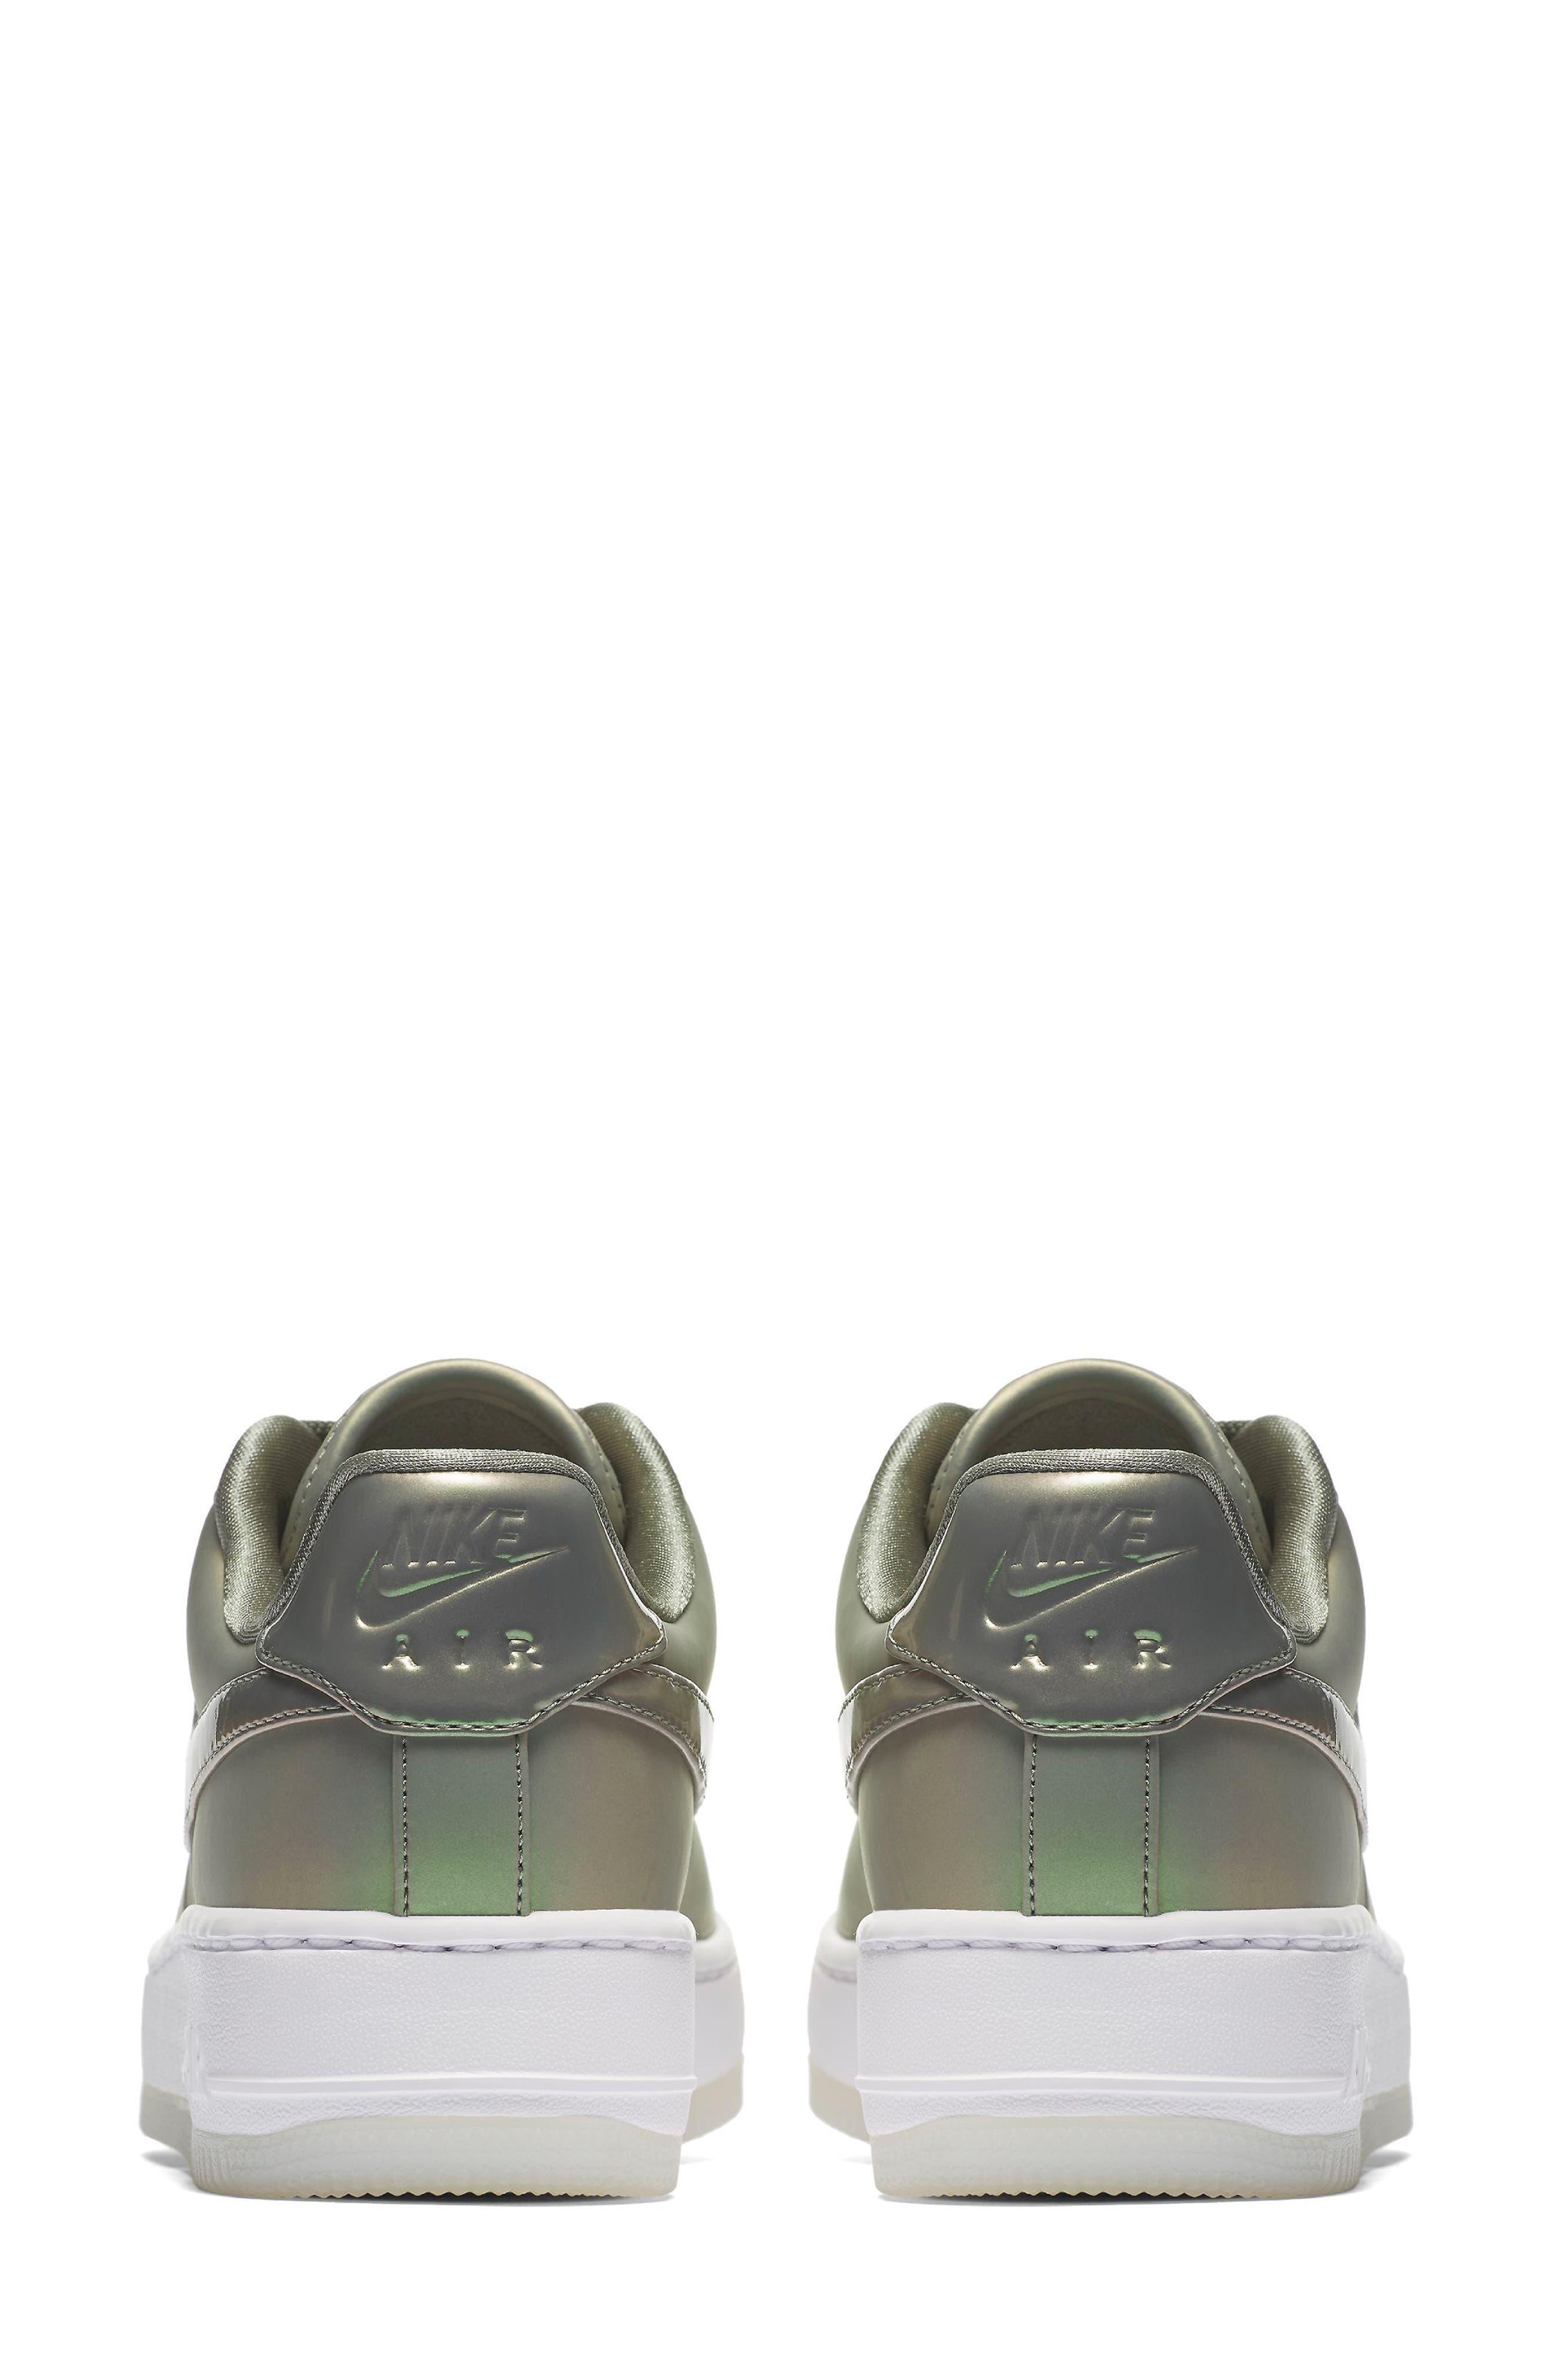 Air Force 1 Upstep Premium LX Shoe,                             Alternate thumbnail 2, color,                             252